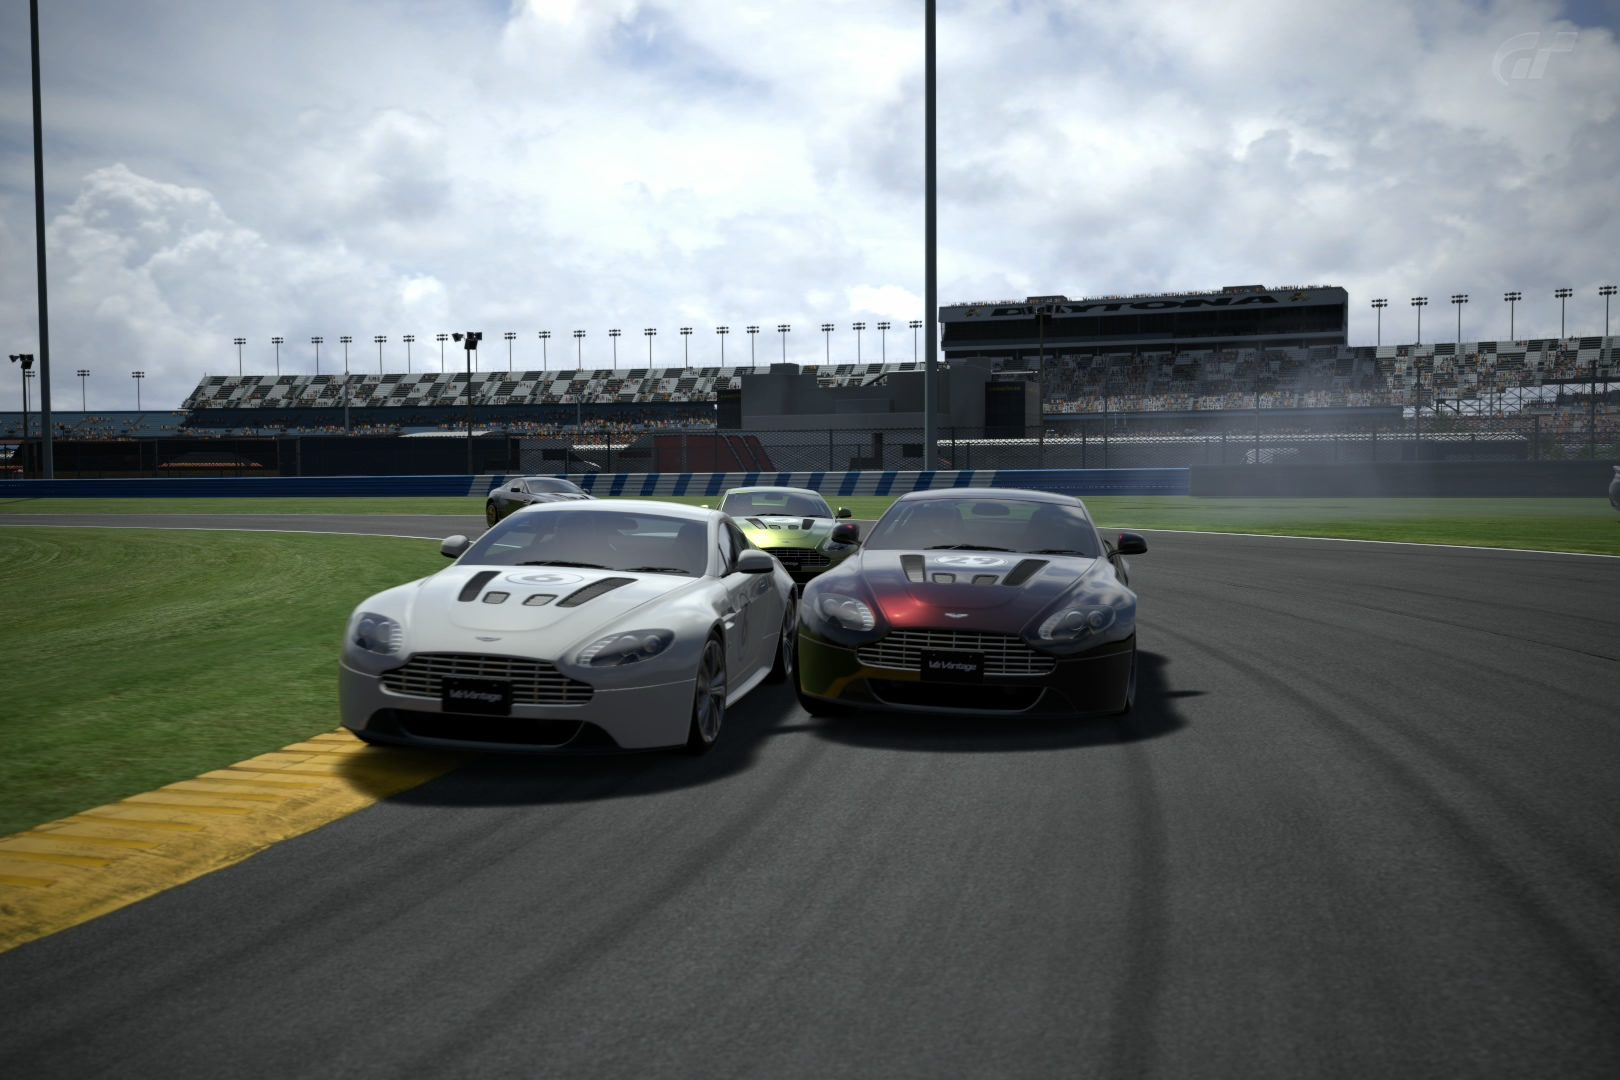 Daytona Road Course_7.jpg